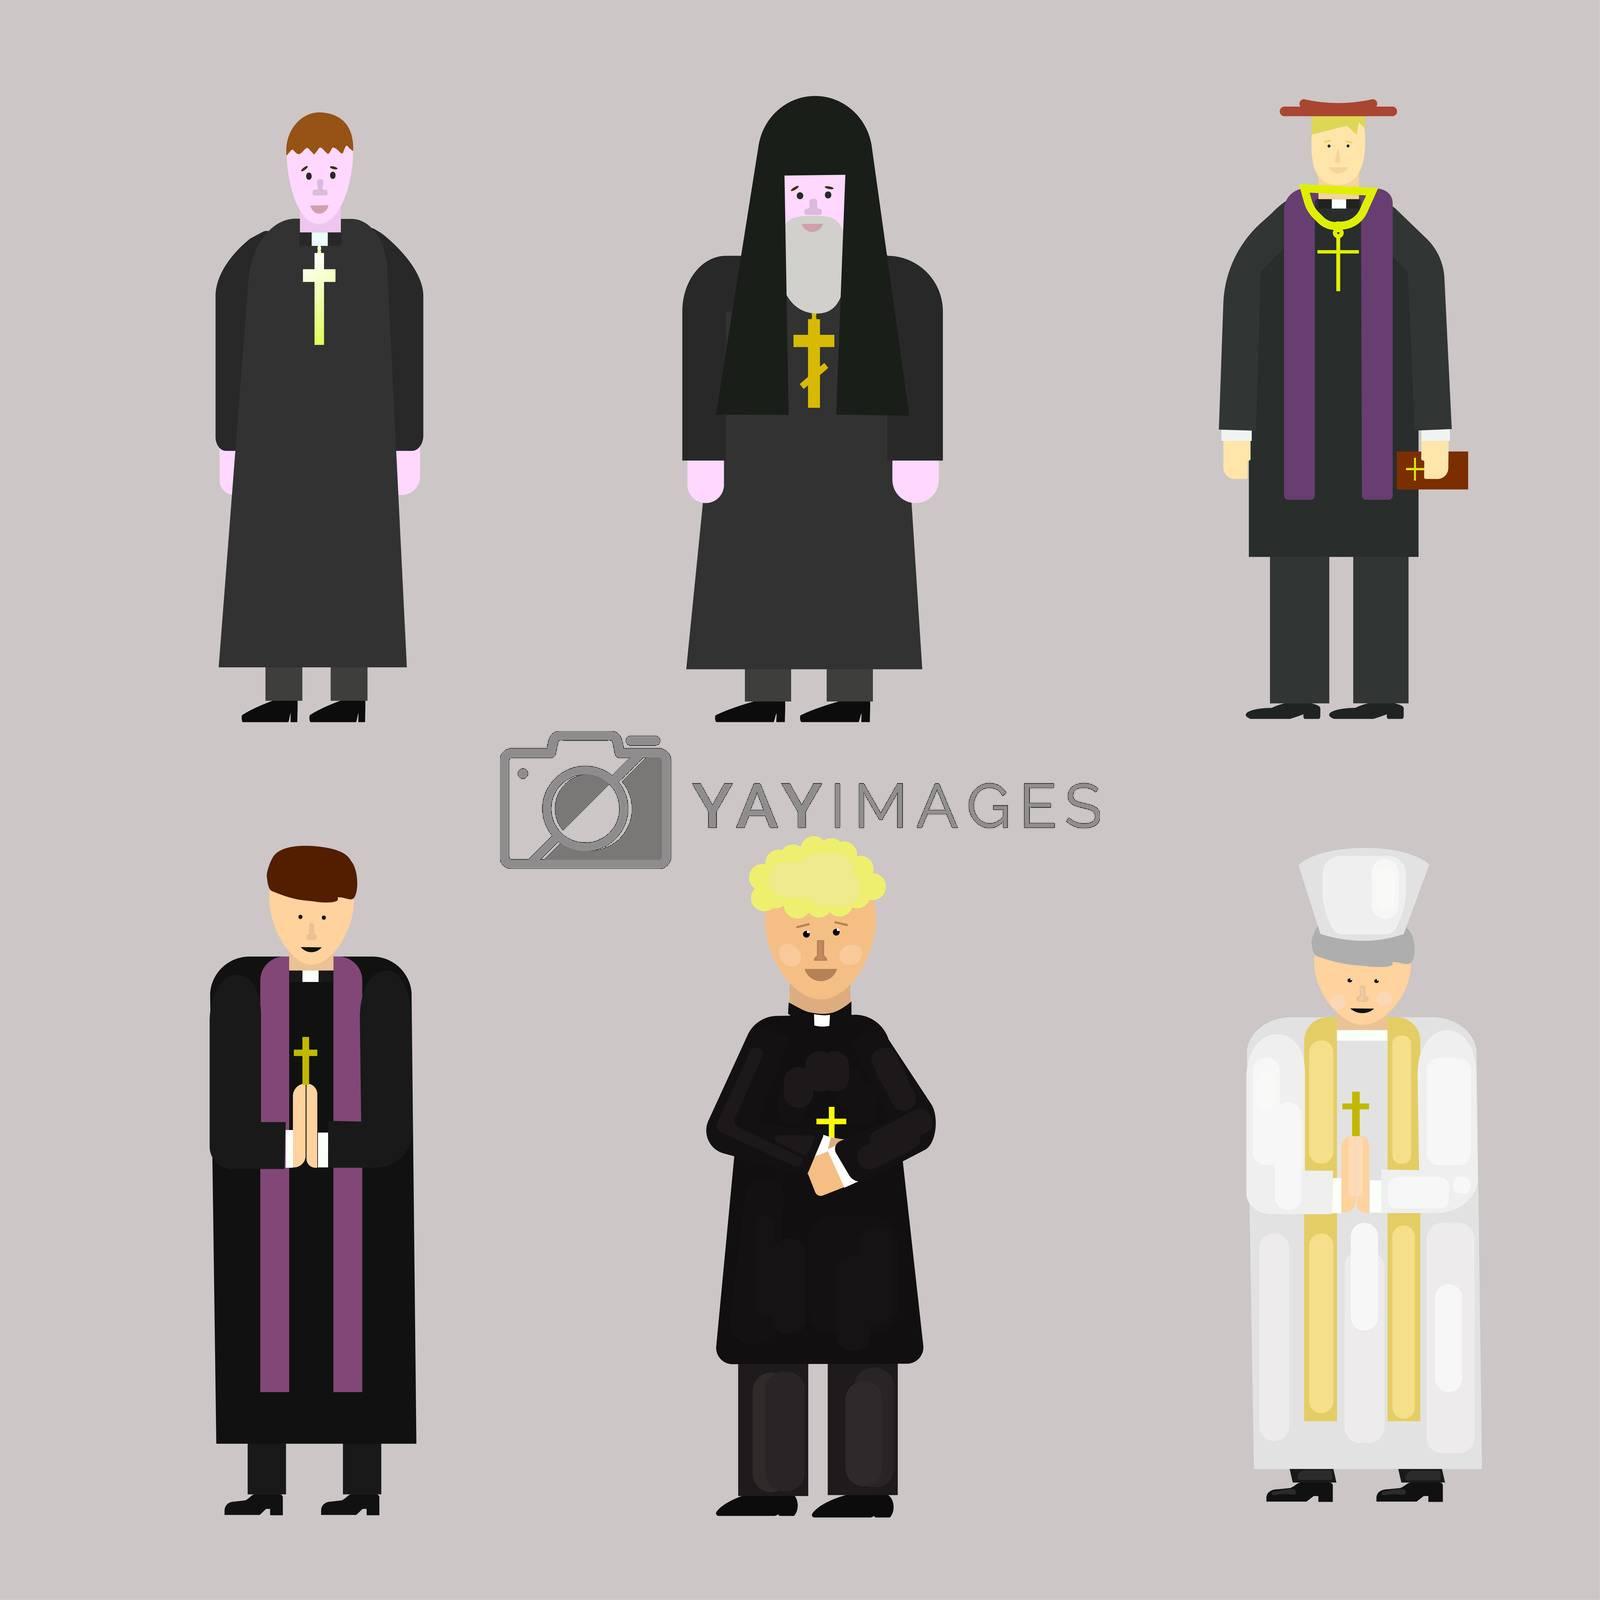 Set of Catholic Christian Staff, Priest Man in Uniform Holding Cross, Bible and Gospel, Bless Parishioners. Religion